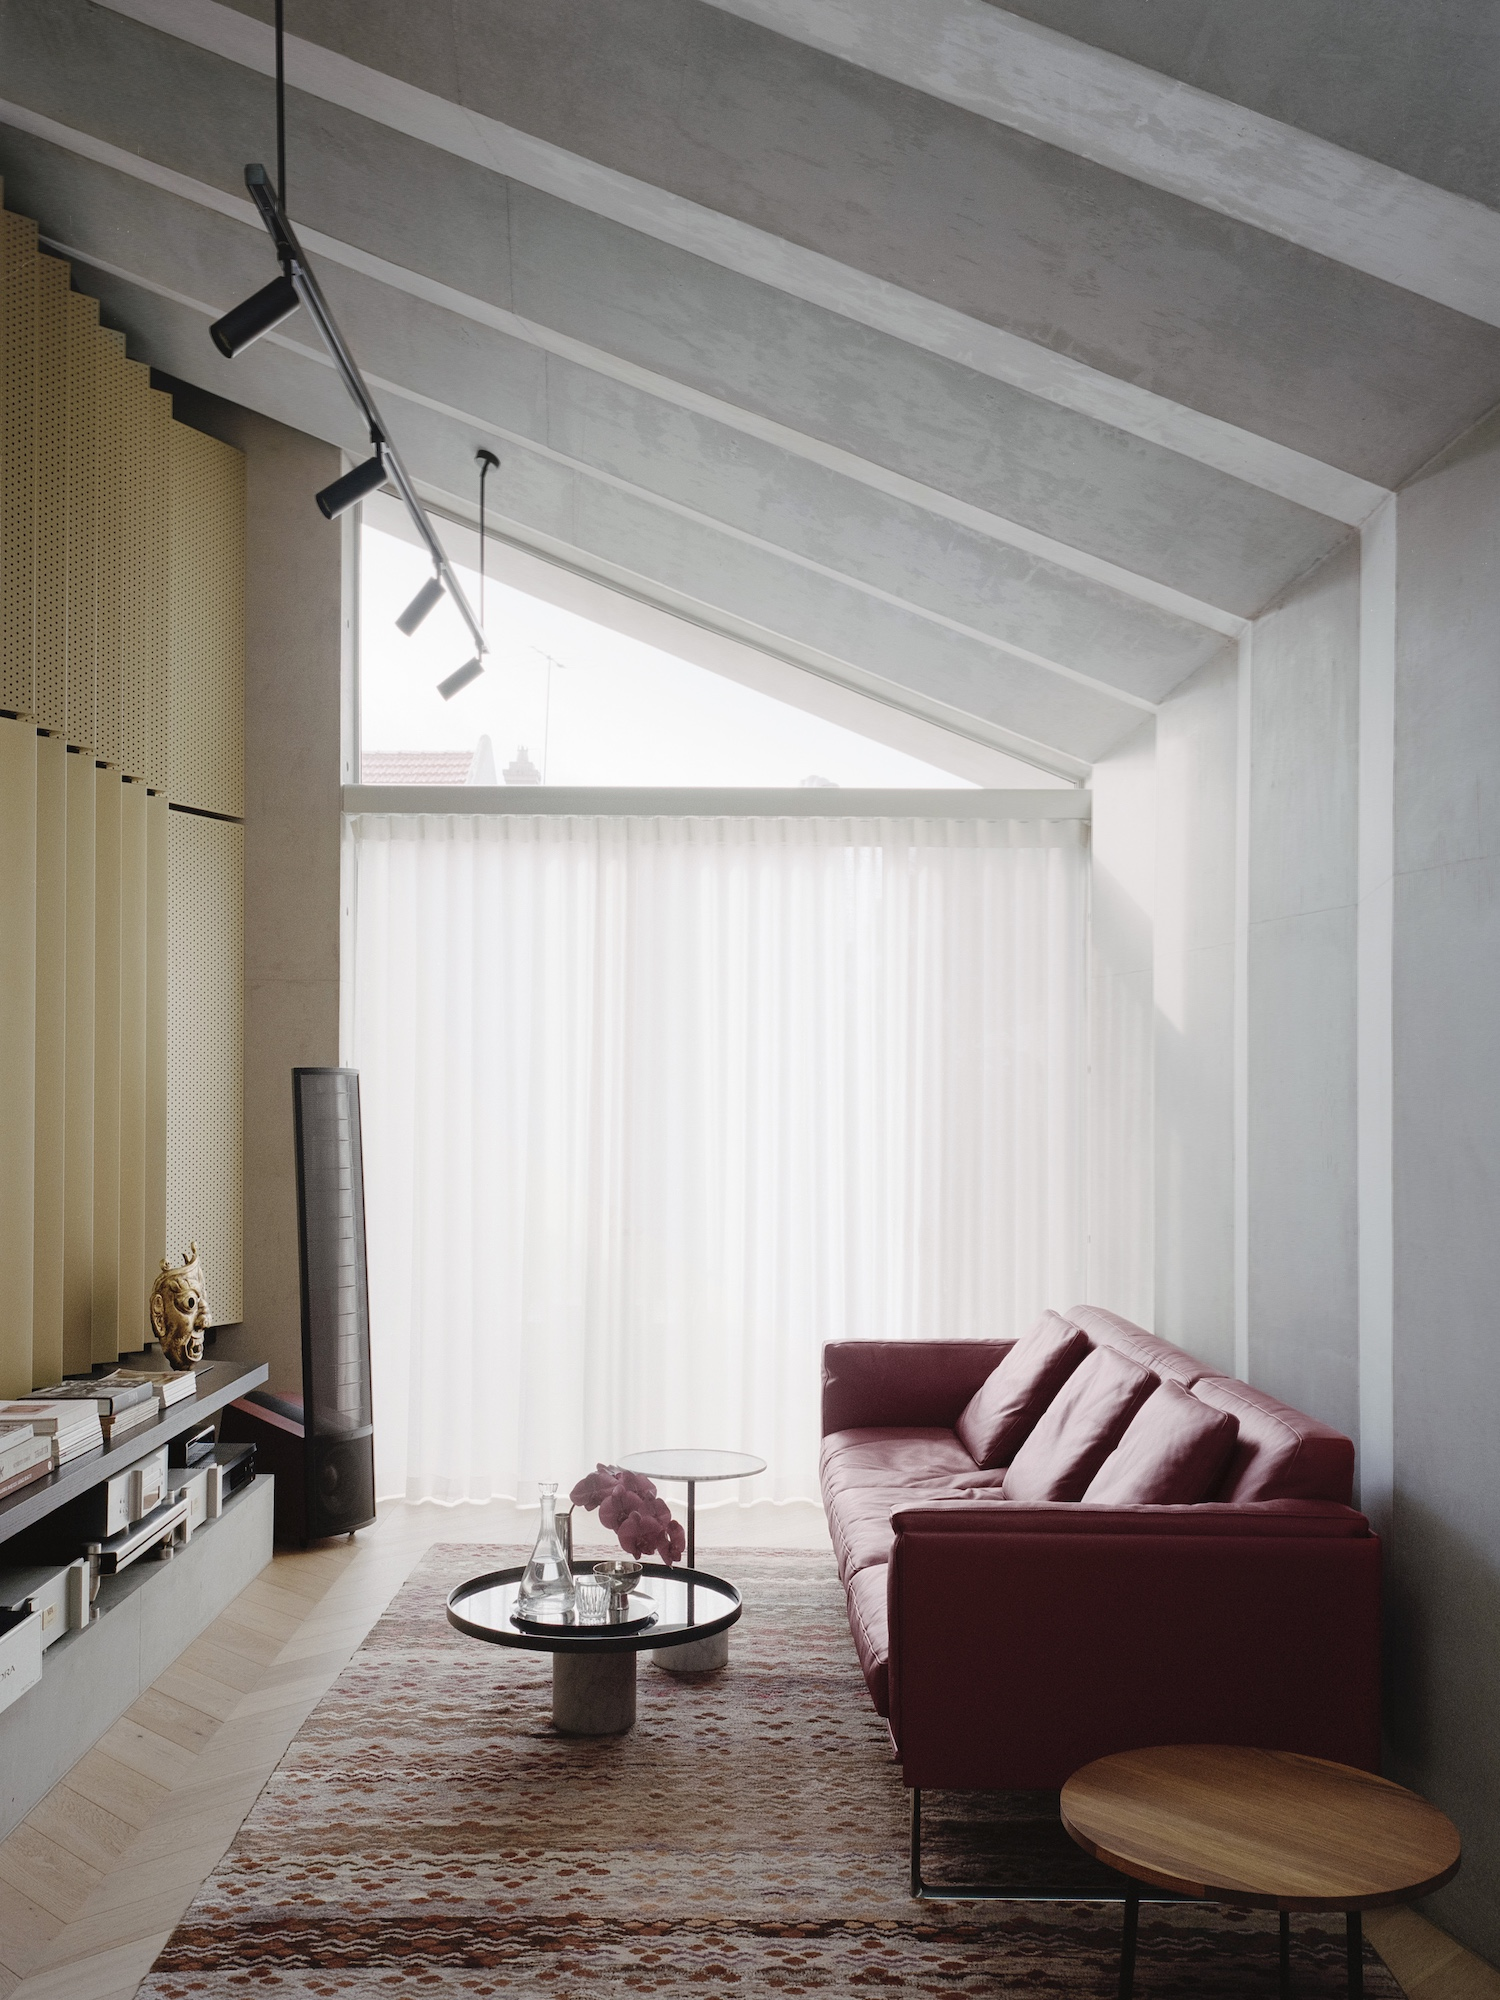 est living pandolfini architects concert hall house 06